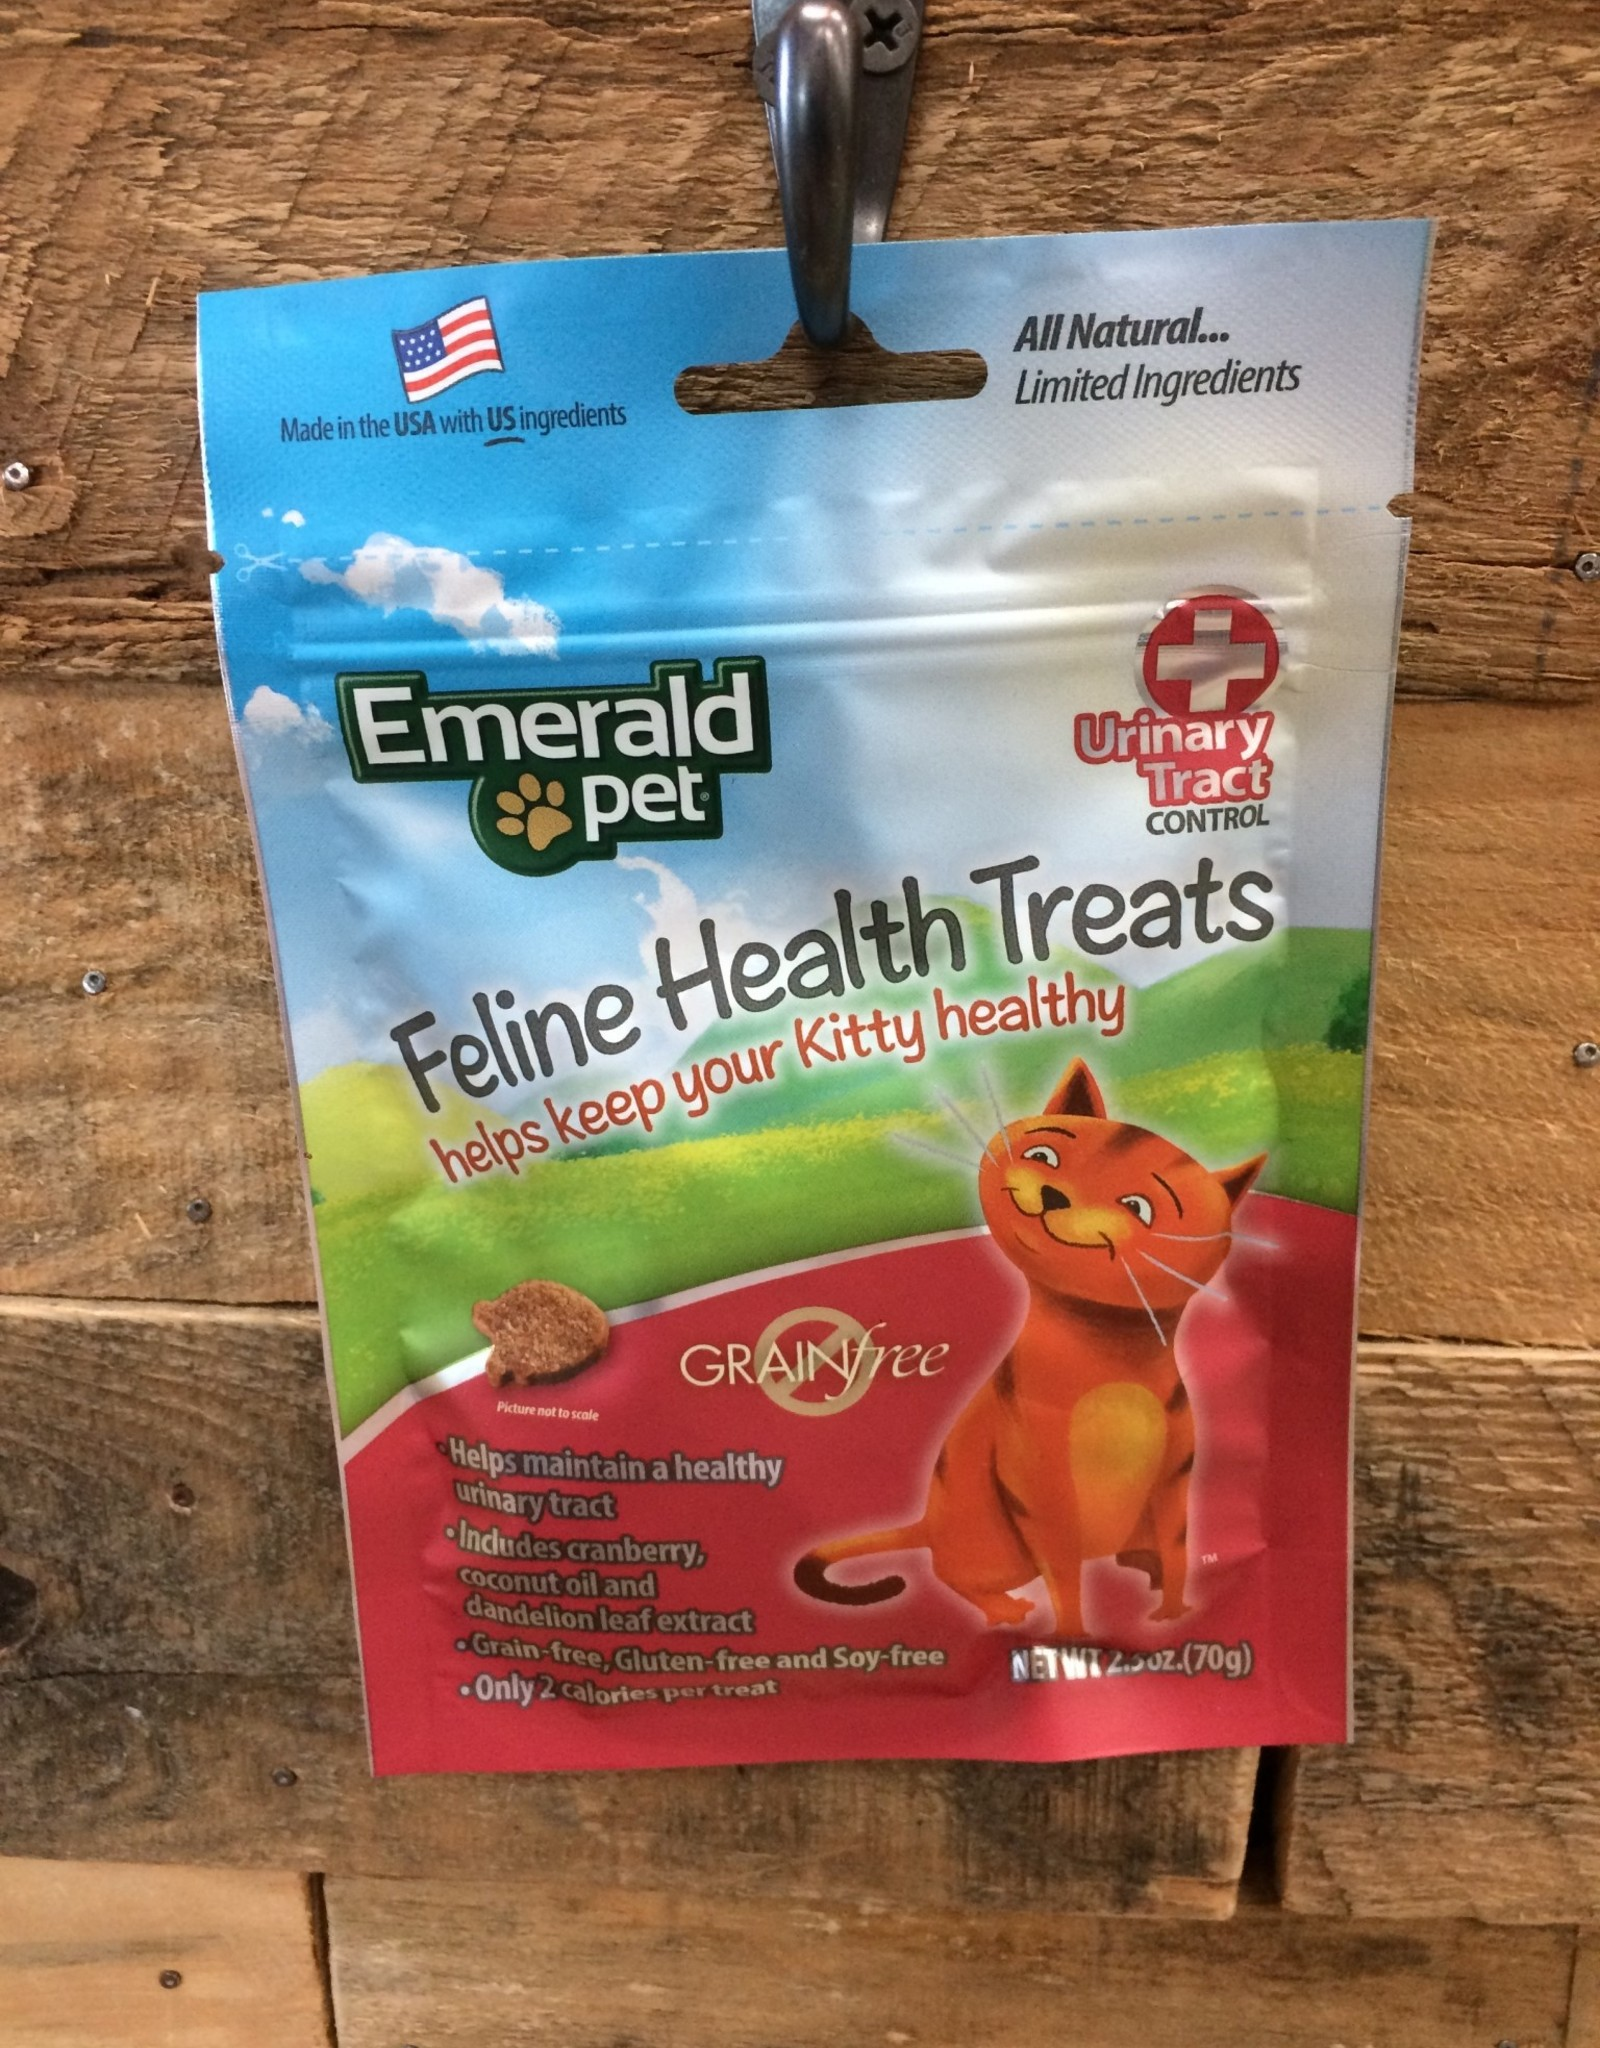 EMERALD PET 2.5 OZ. URINARY TRACT FORMULA CAT TREATS - CHICKEN